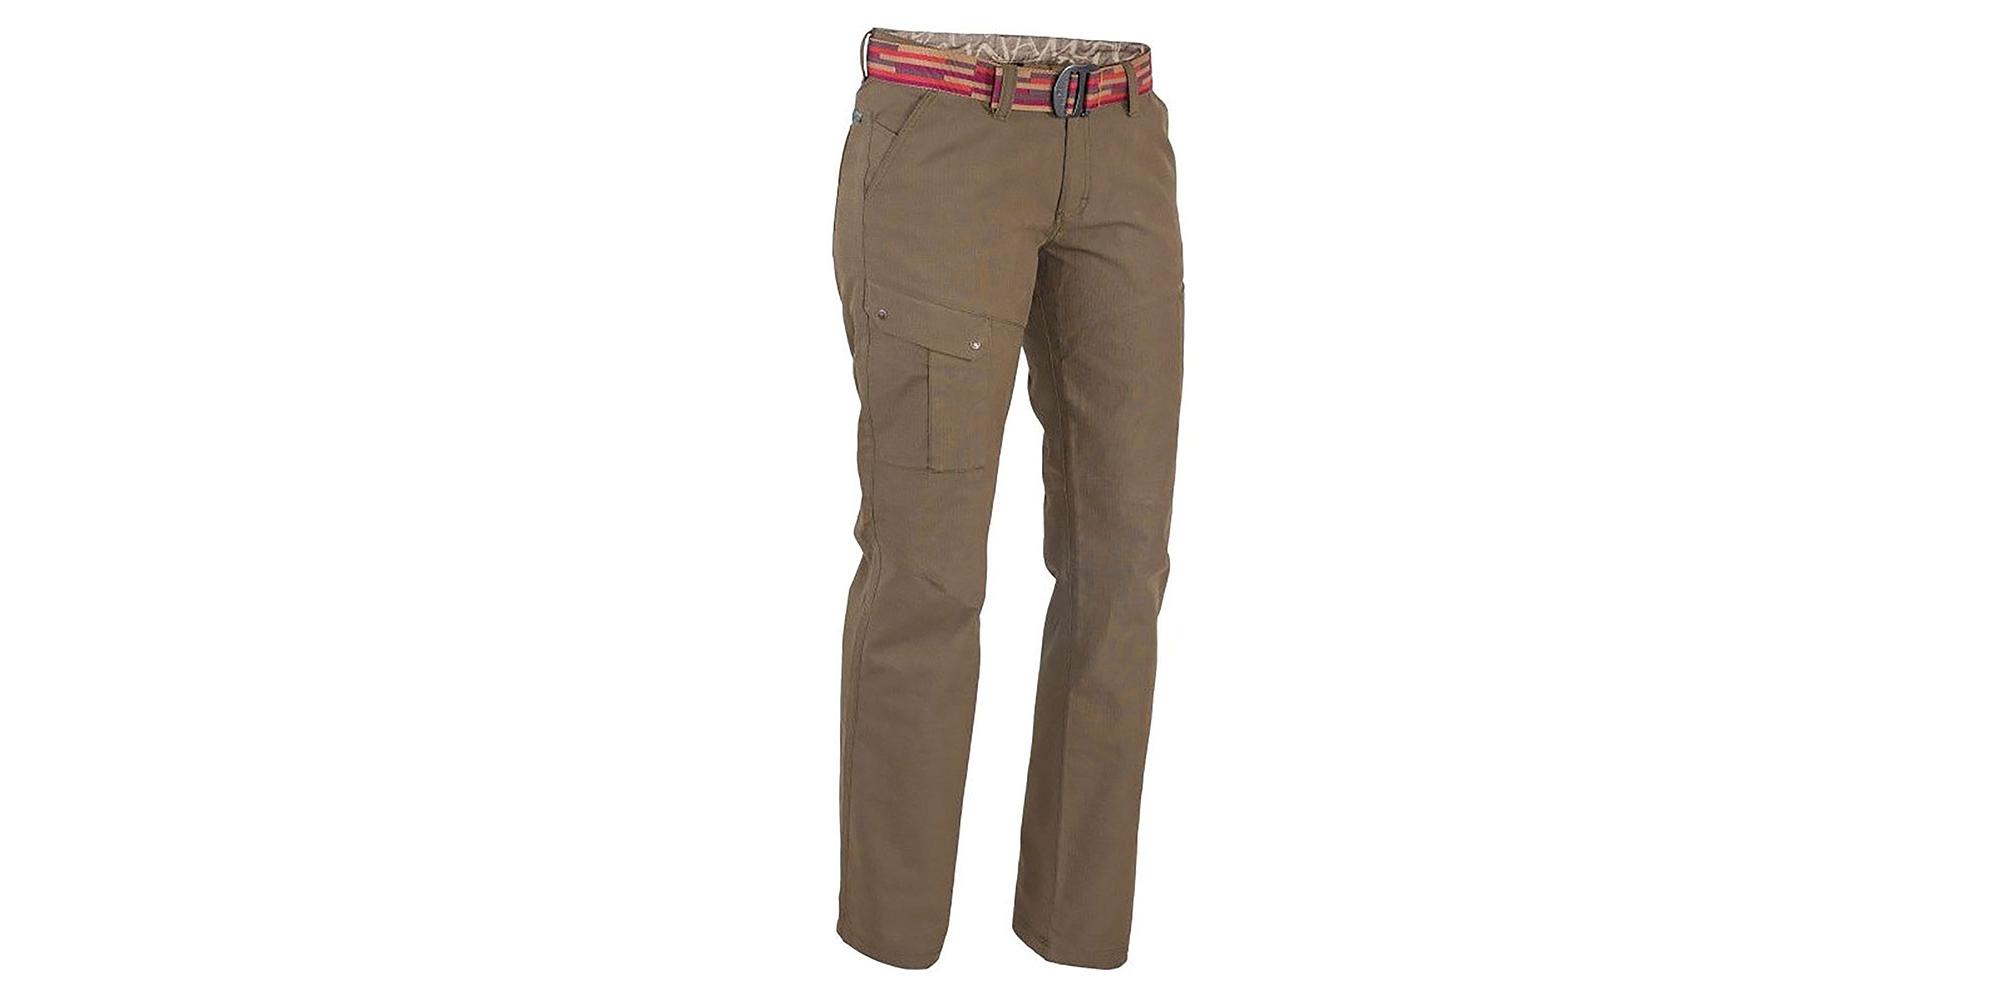 Dámské kalhoty Warmpeace Elkie Lady